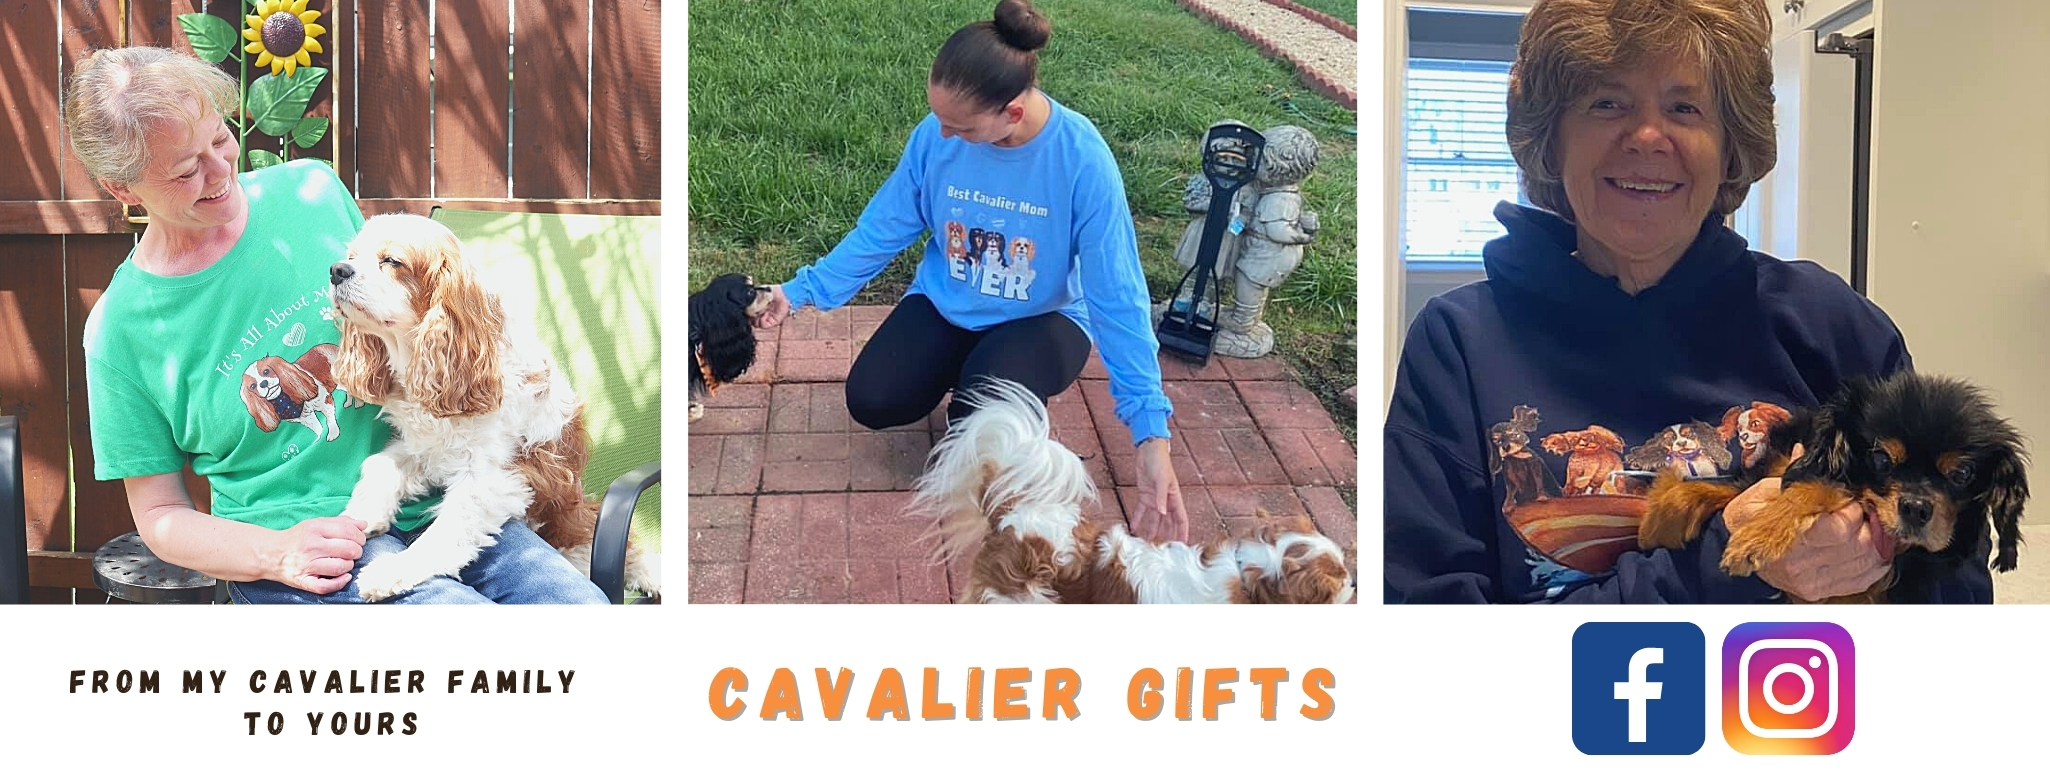 Original Cavalier King Charles Spaniel Gifts